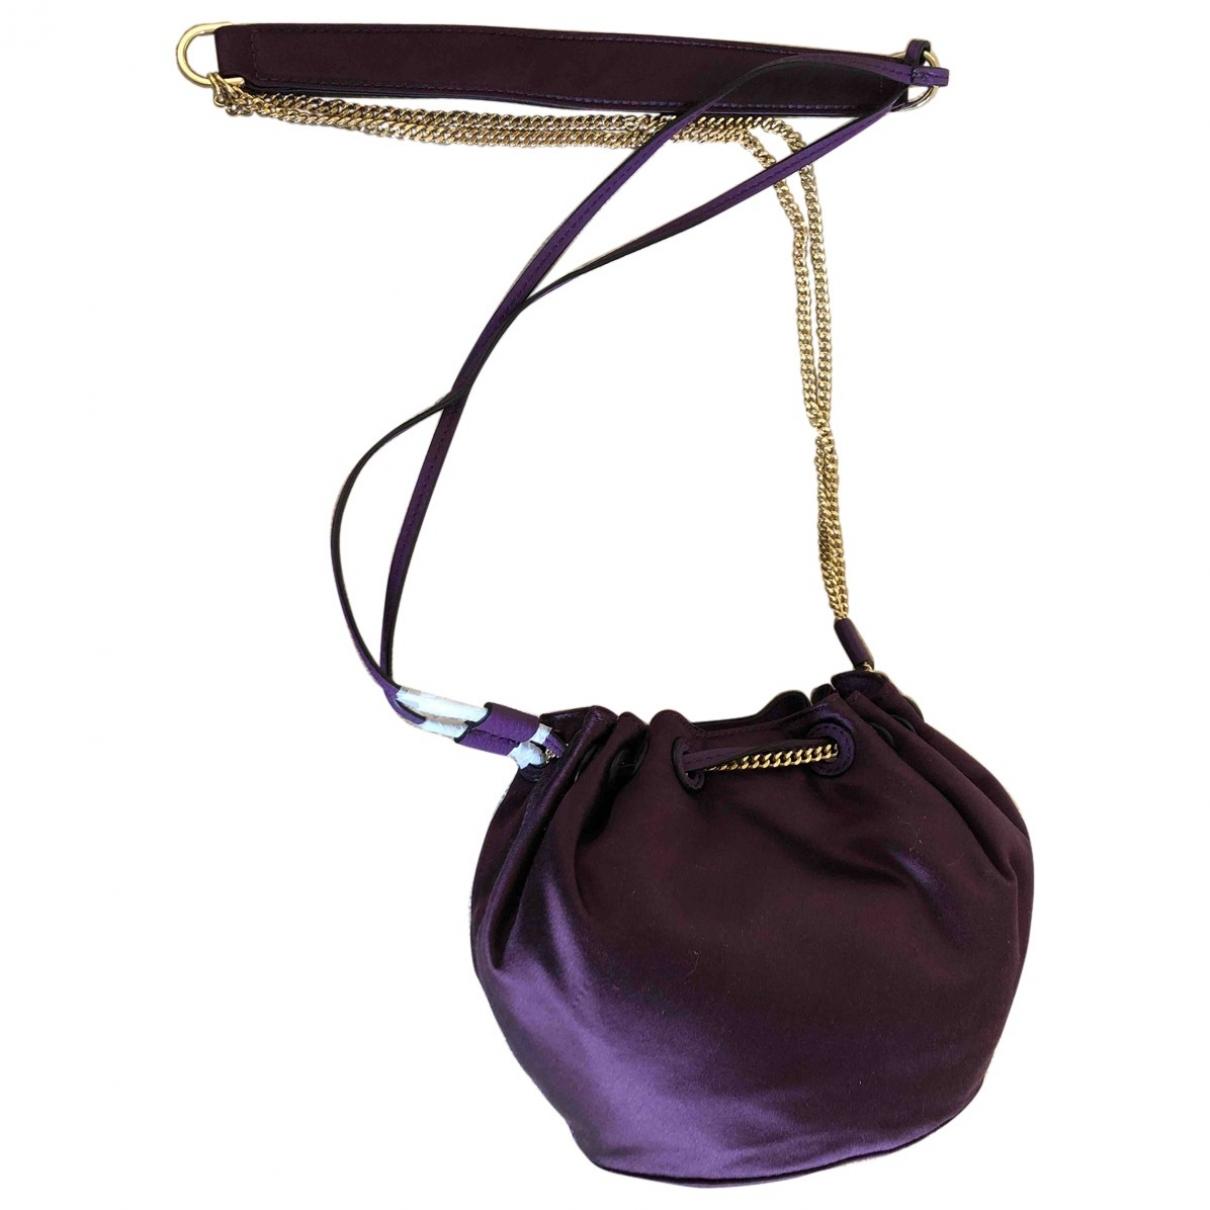 Diane Von Furstenberg - Sac a main   pour femme en soie - violet